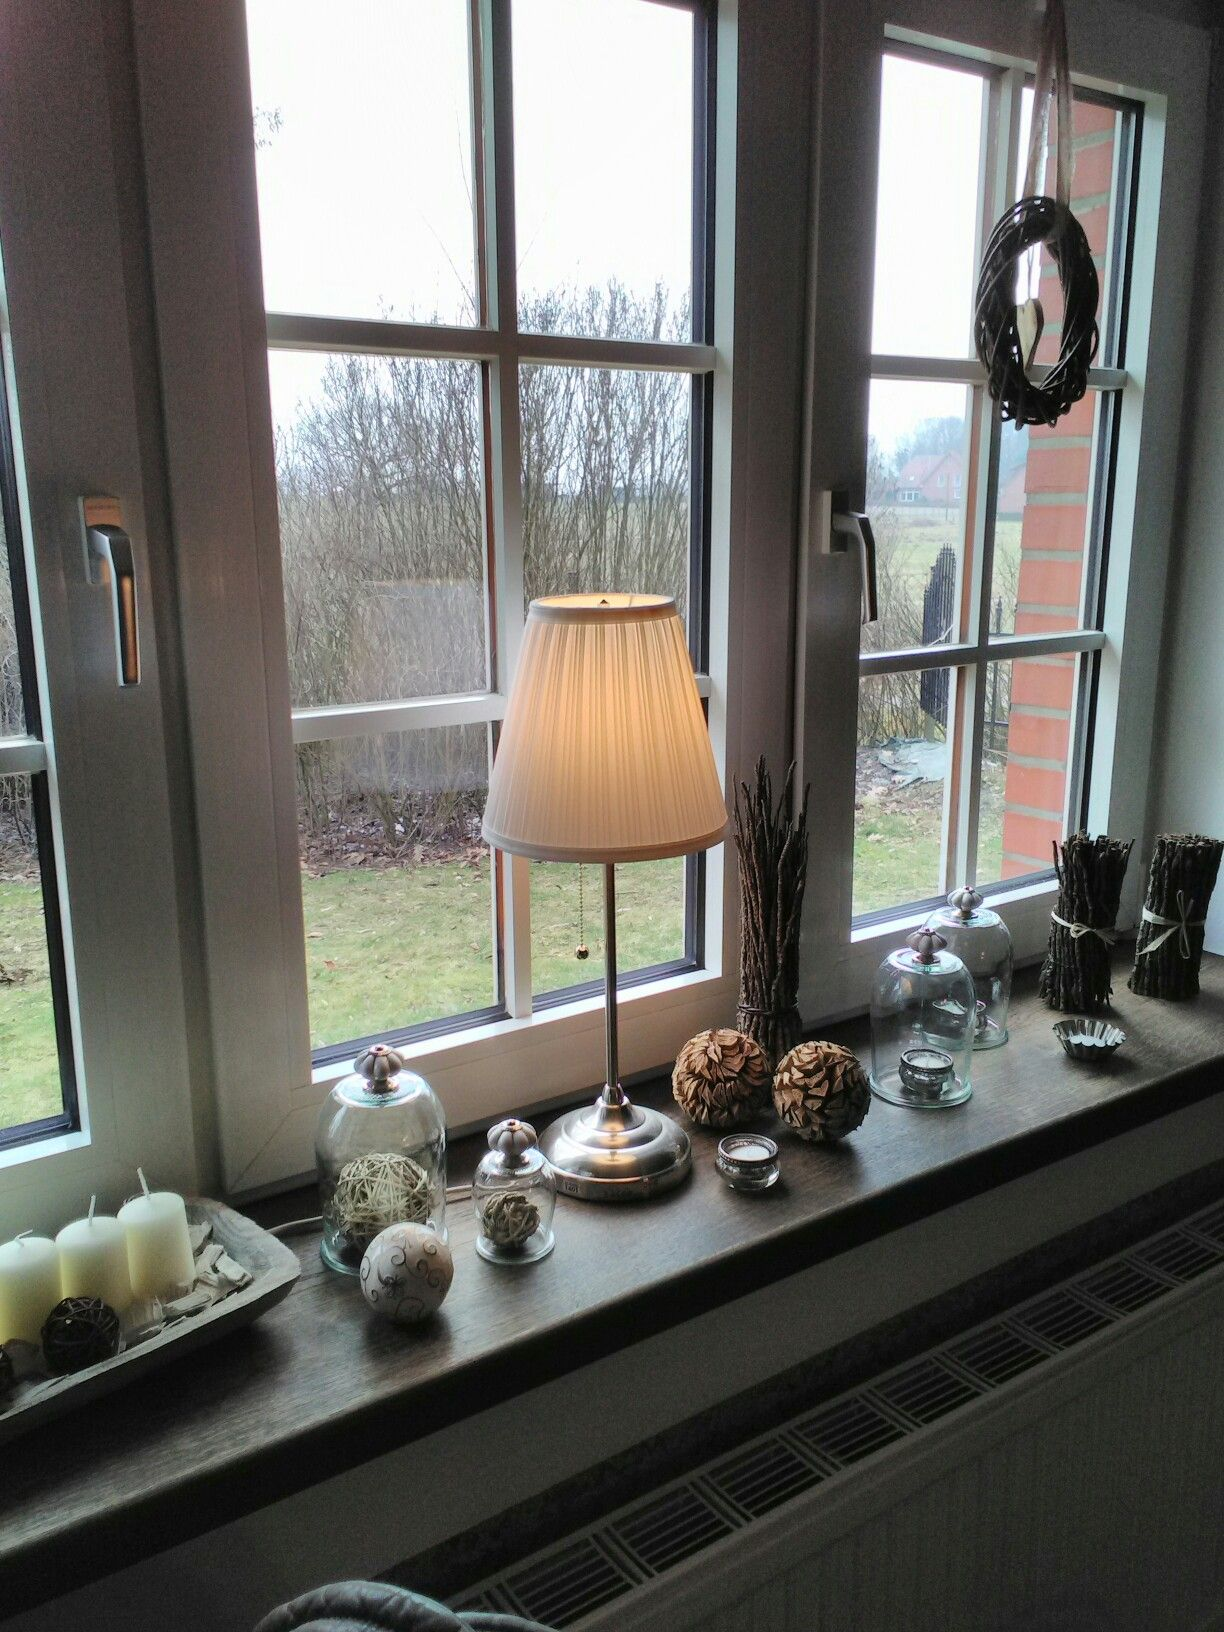 Fensterbank fenster dekorieren pinterest Dekoration fensterbank innen